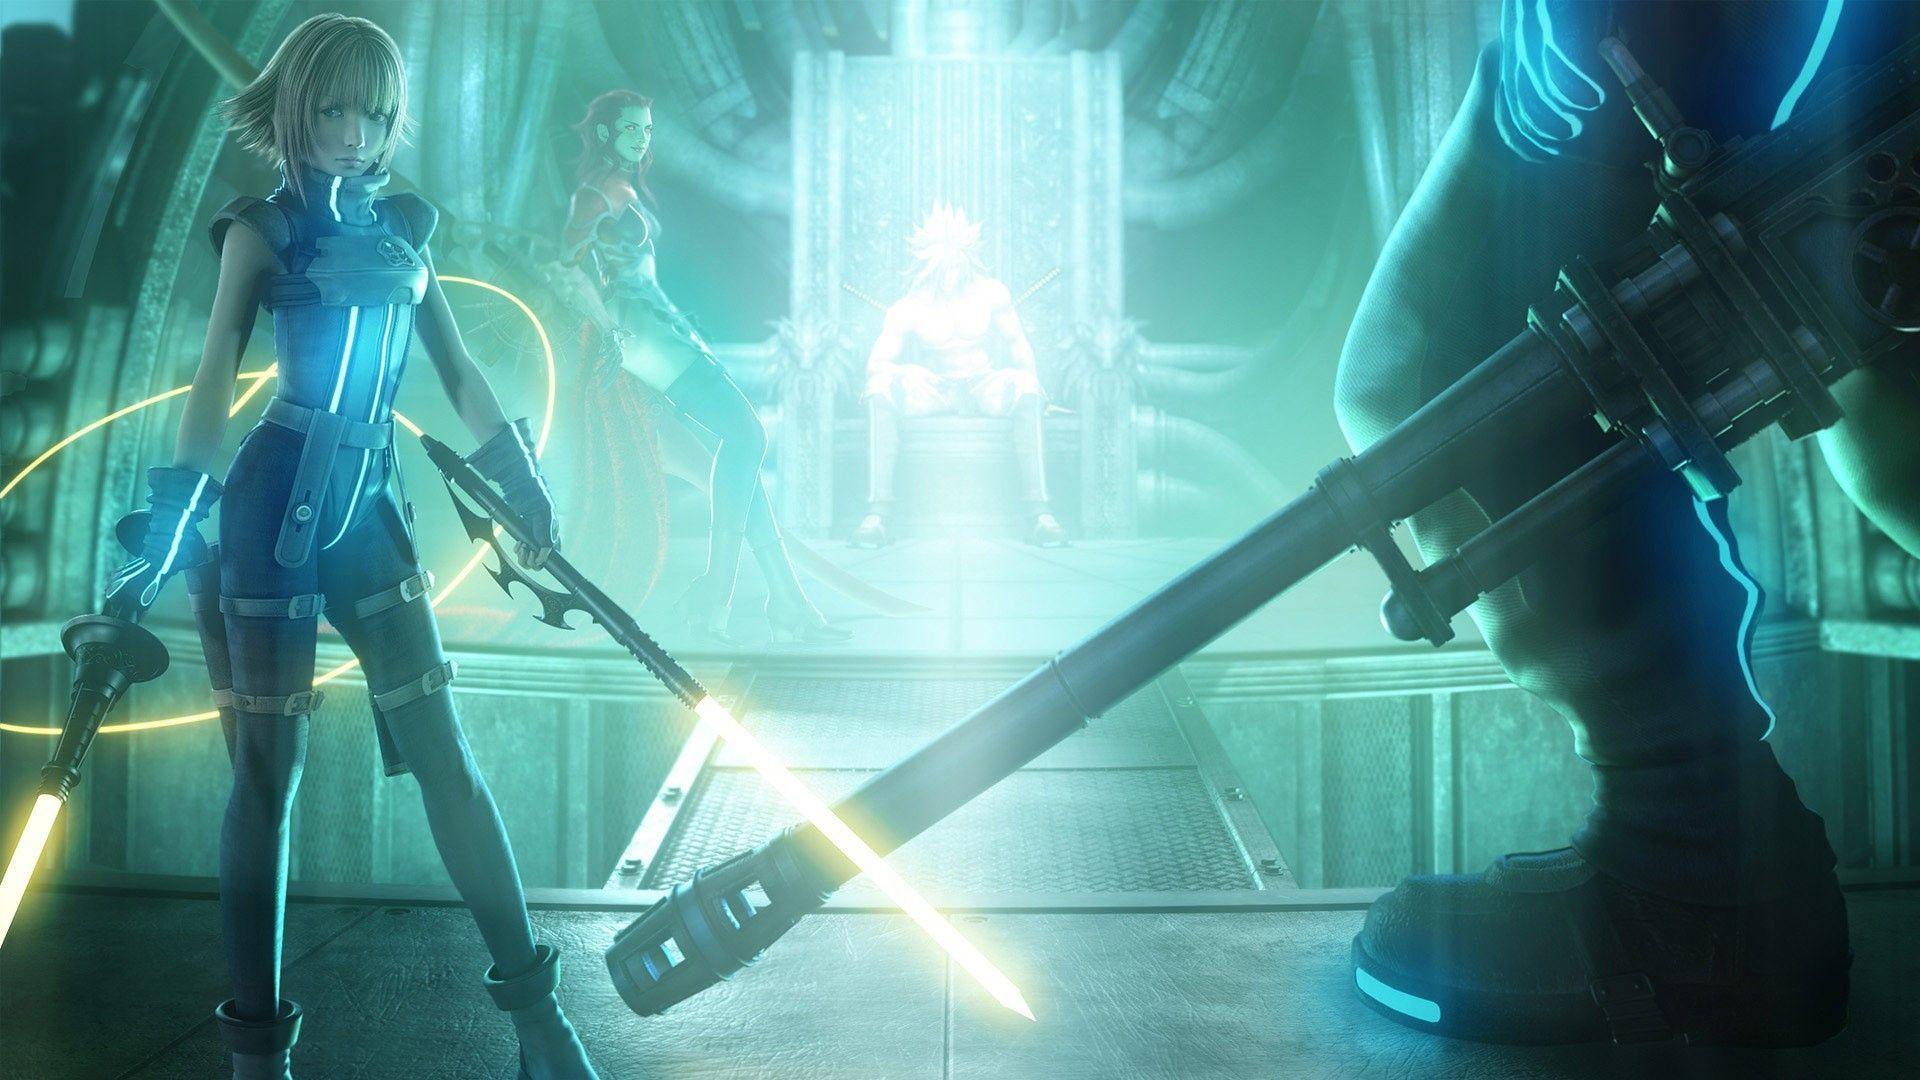 Final Fantasy 7 Wallpapers - Wallpaper Cave